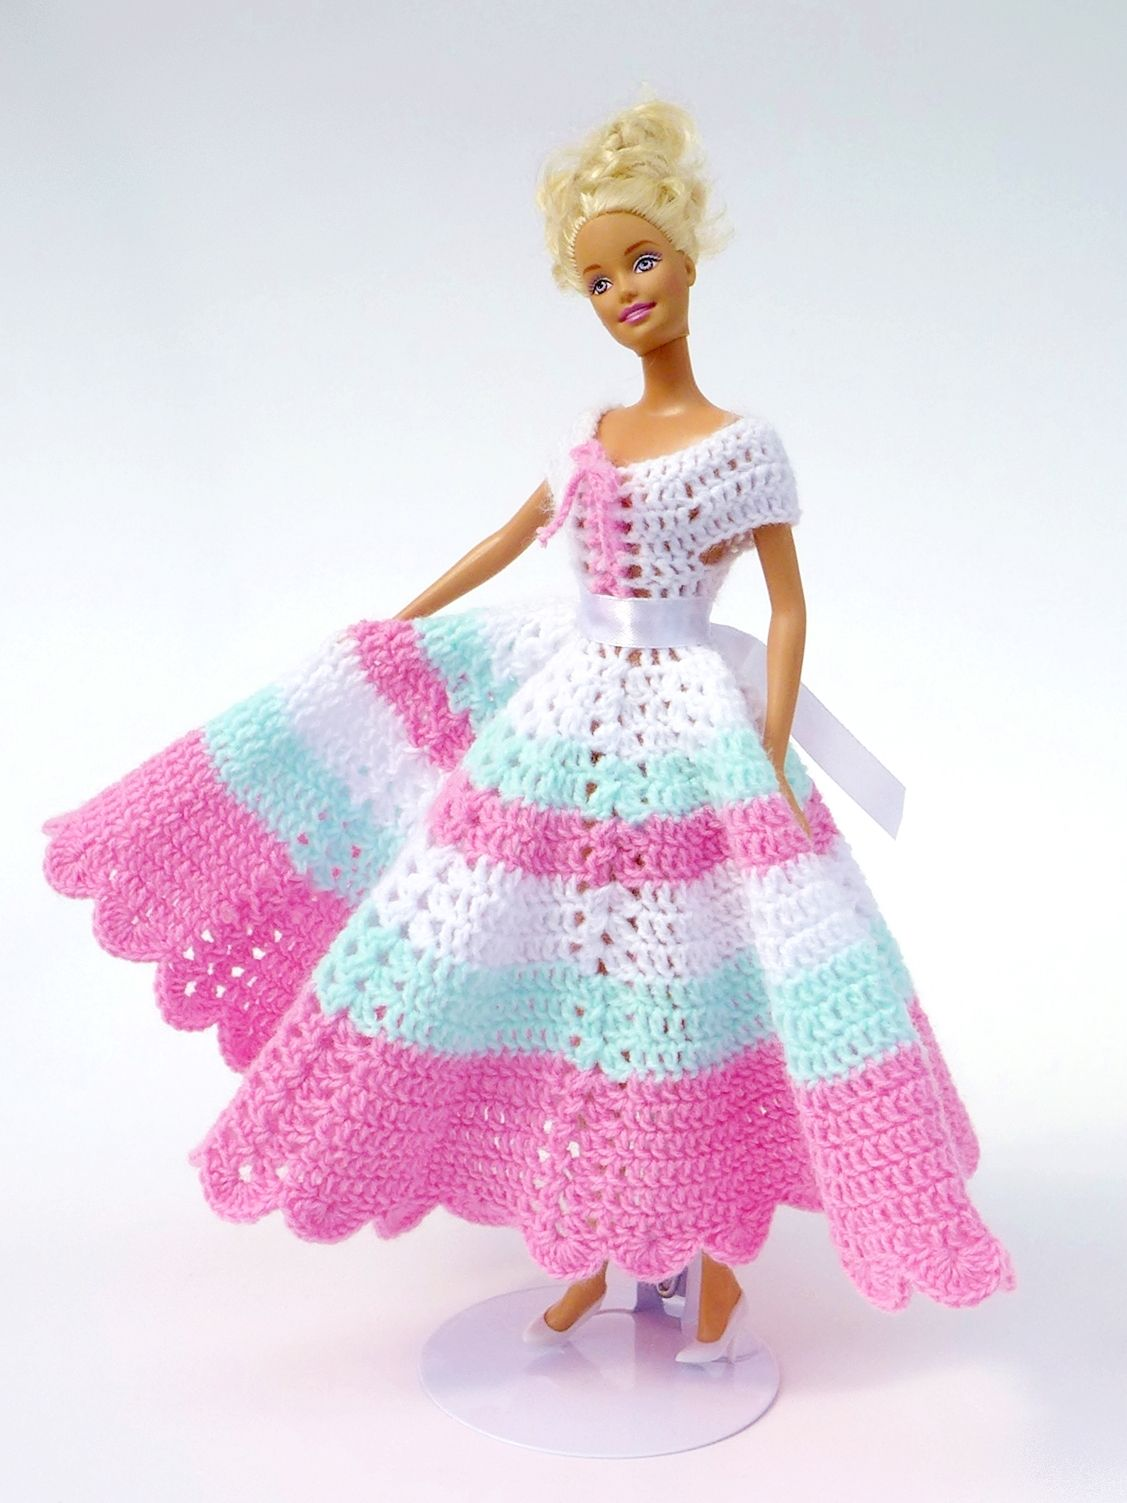 wonderful length for barbie | Miniaturas | Pinterest | Muñecas ...